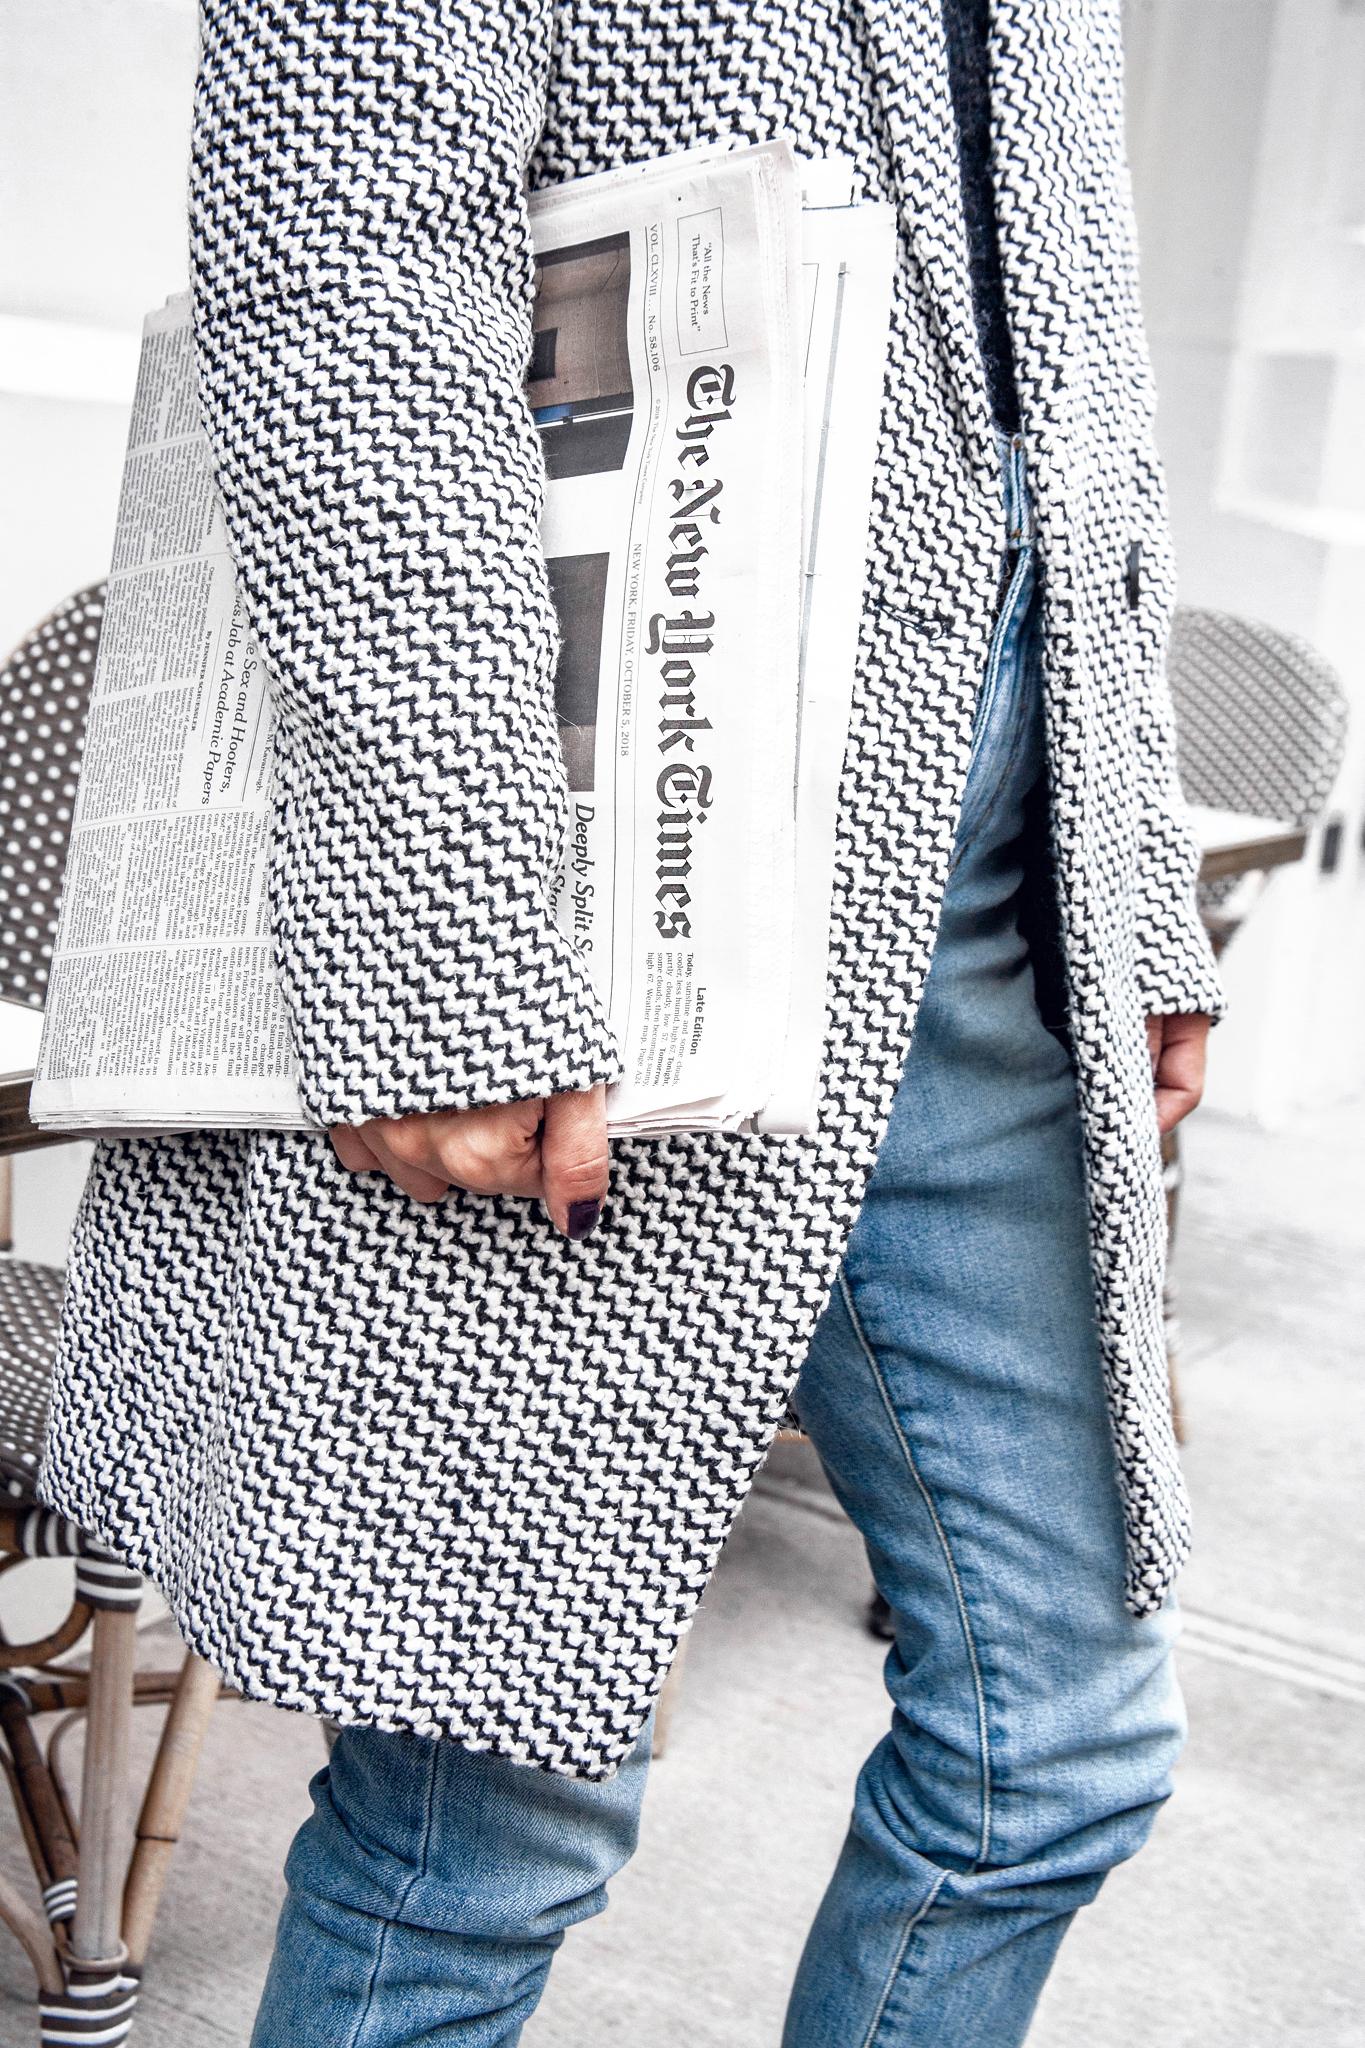 Chic tweed coat